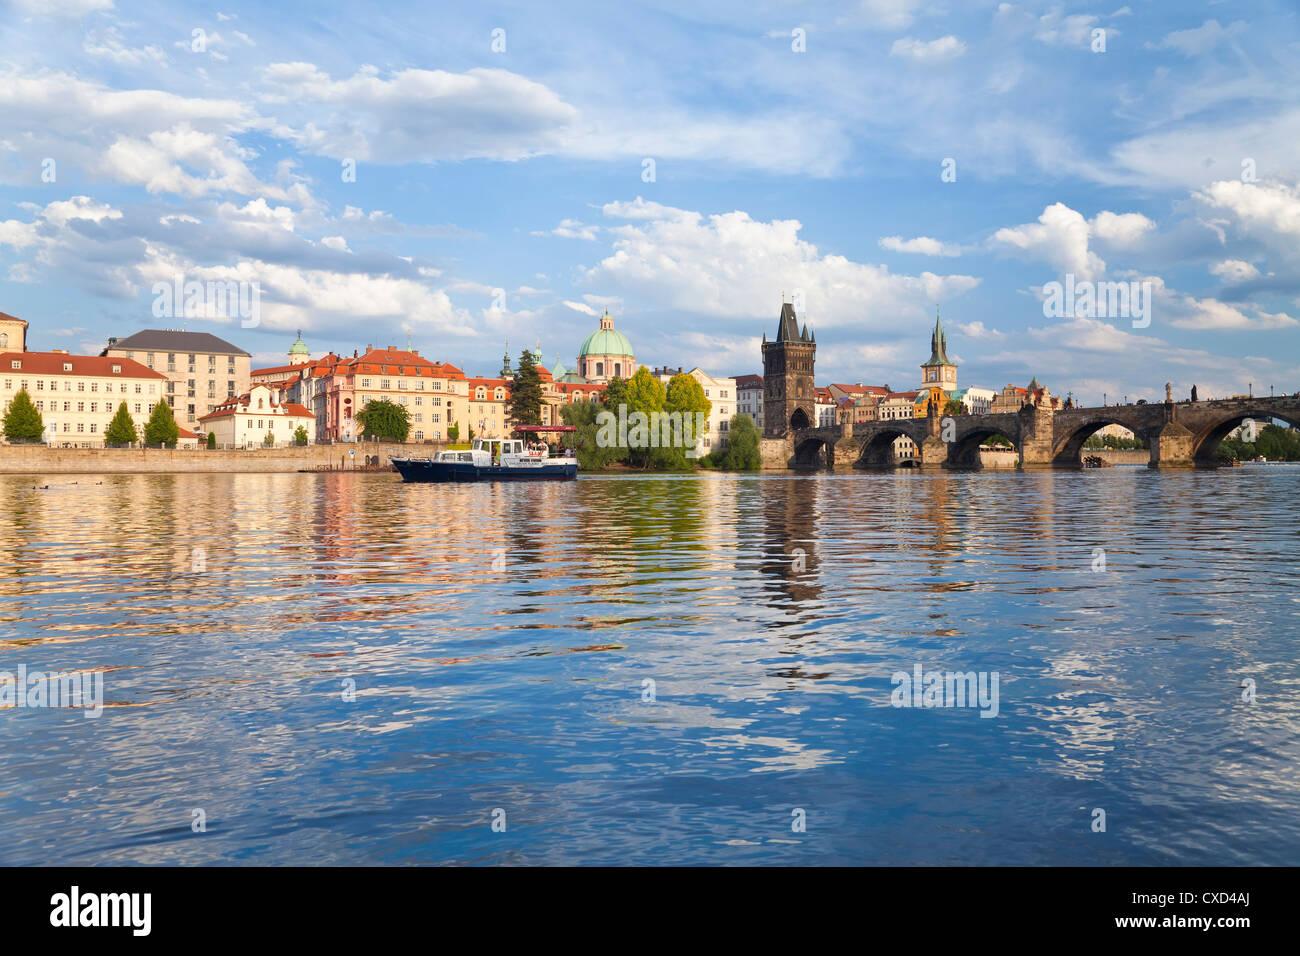 Charles Bridge and the Vltava river, Old Town, UNESCO World Heritage Site, Prague, Czech Republic, Europe - Stock Image